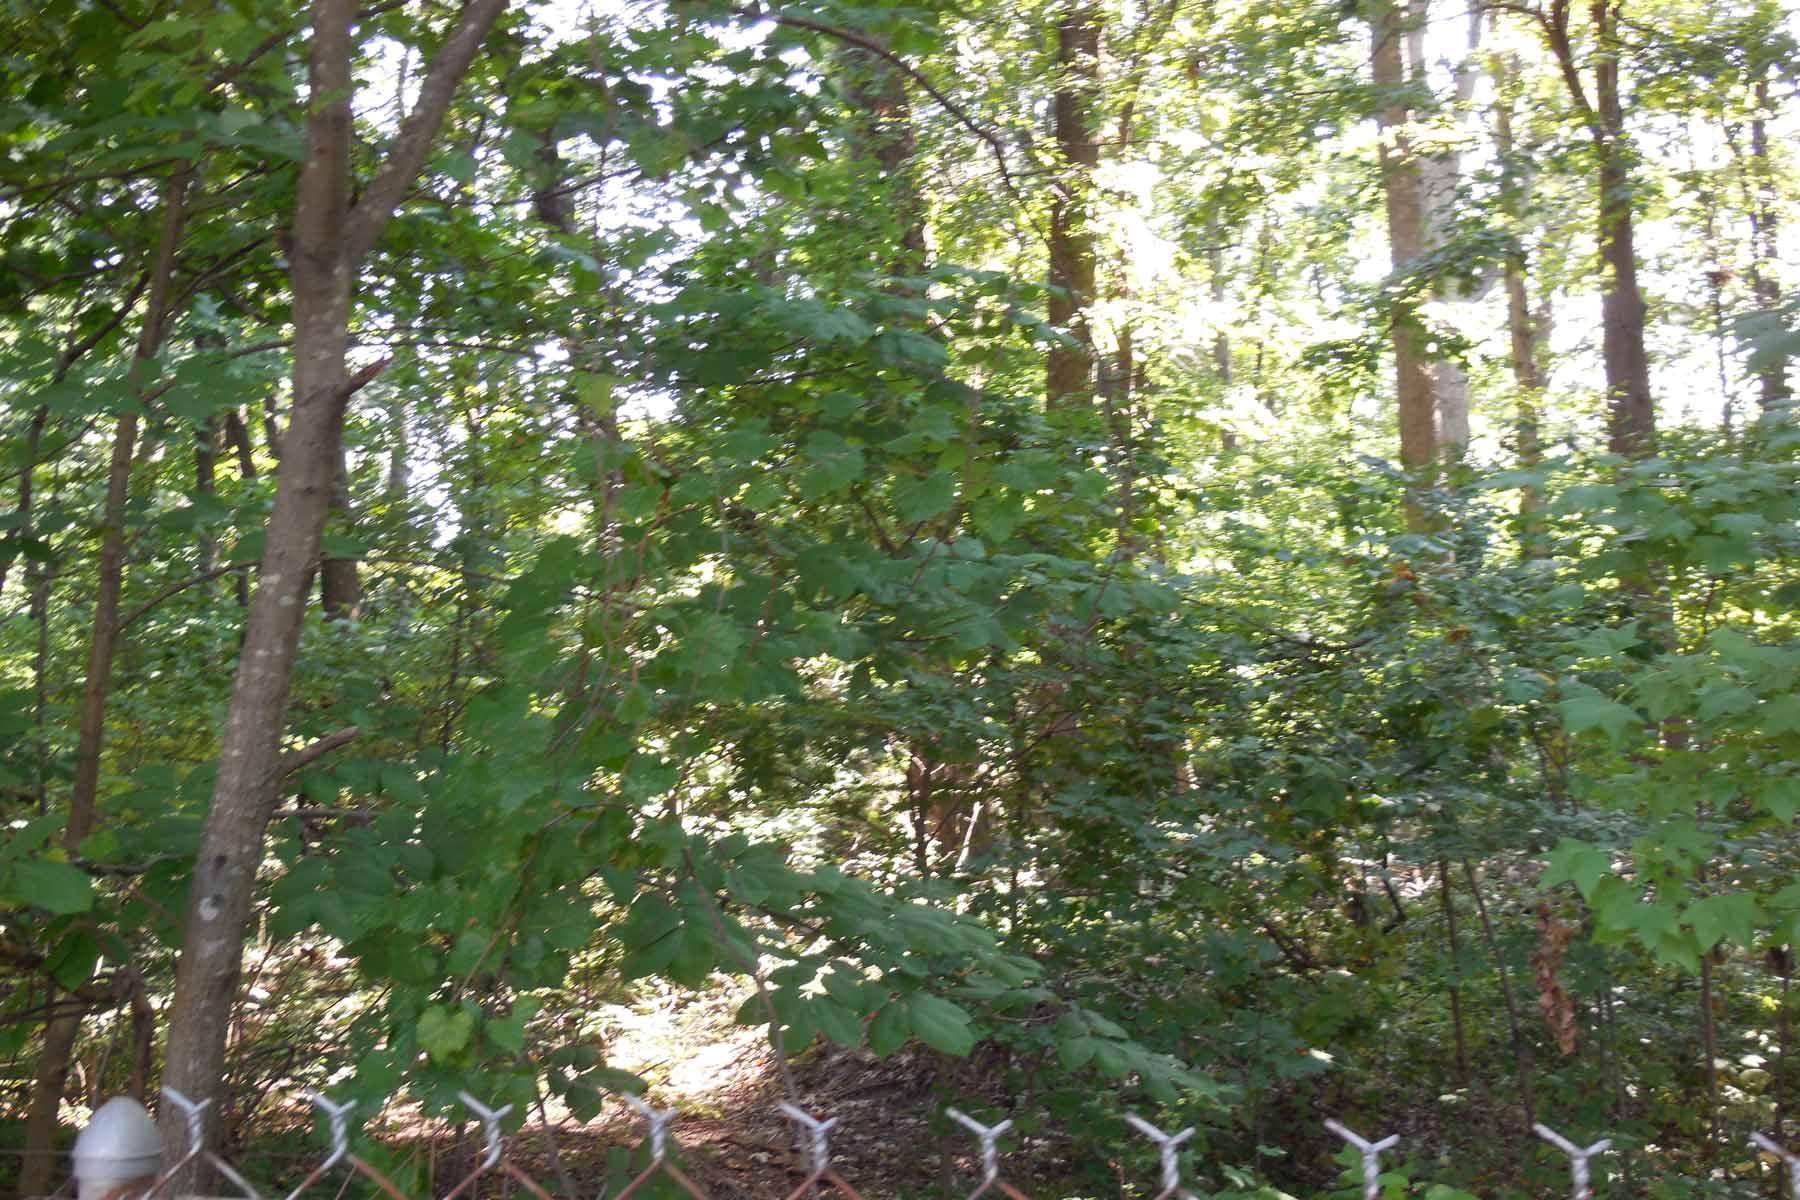 Terreno por un Venta en Residential Level Wooded Lot 3100 Reps Miller Road Norcross, Georgia, 30071 Estados Unidos